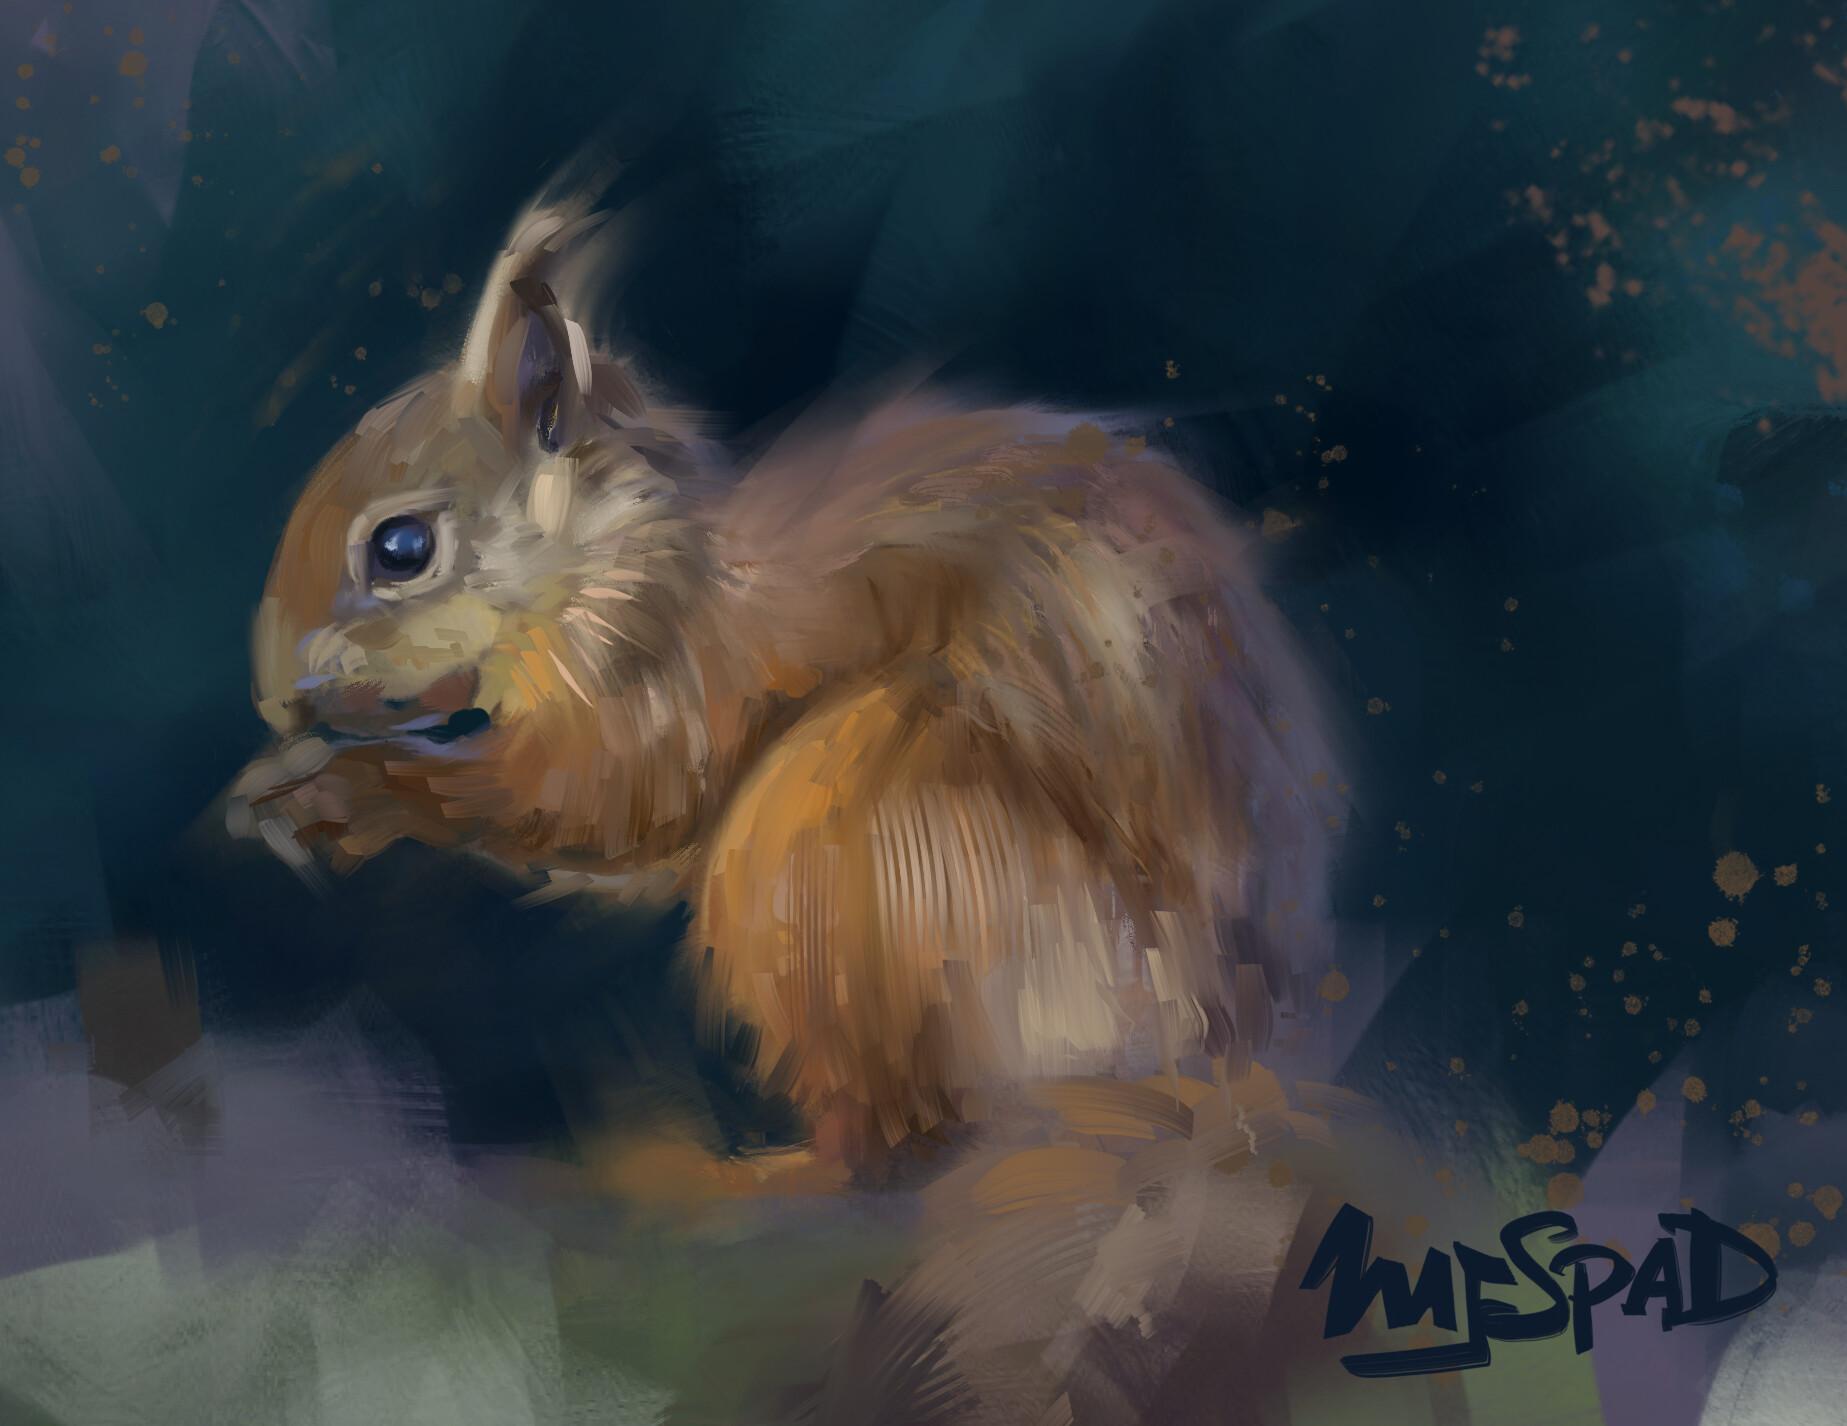 Mj venegas spadafora squirrel